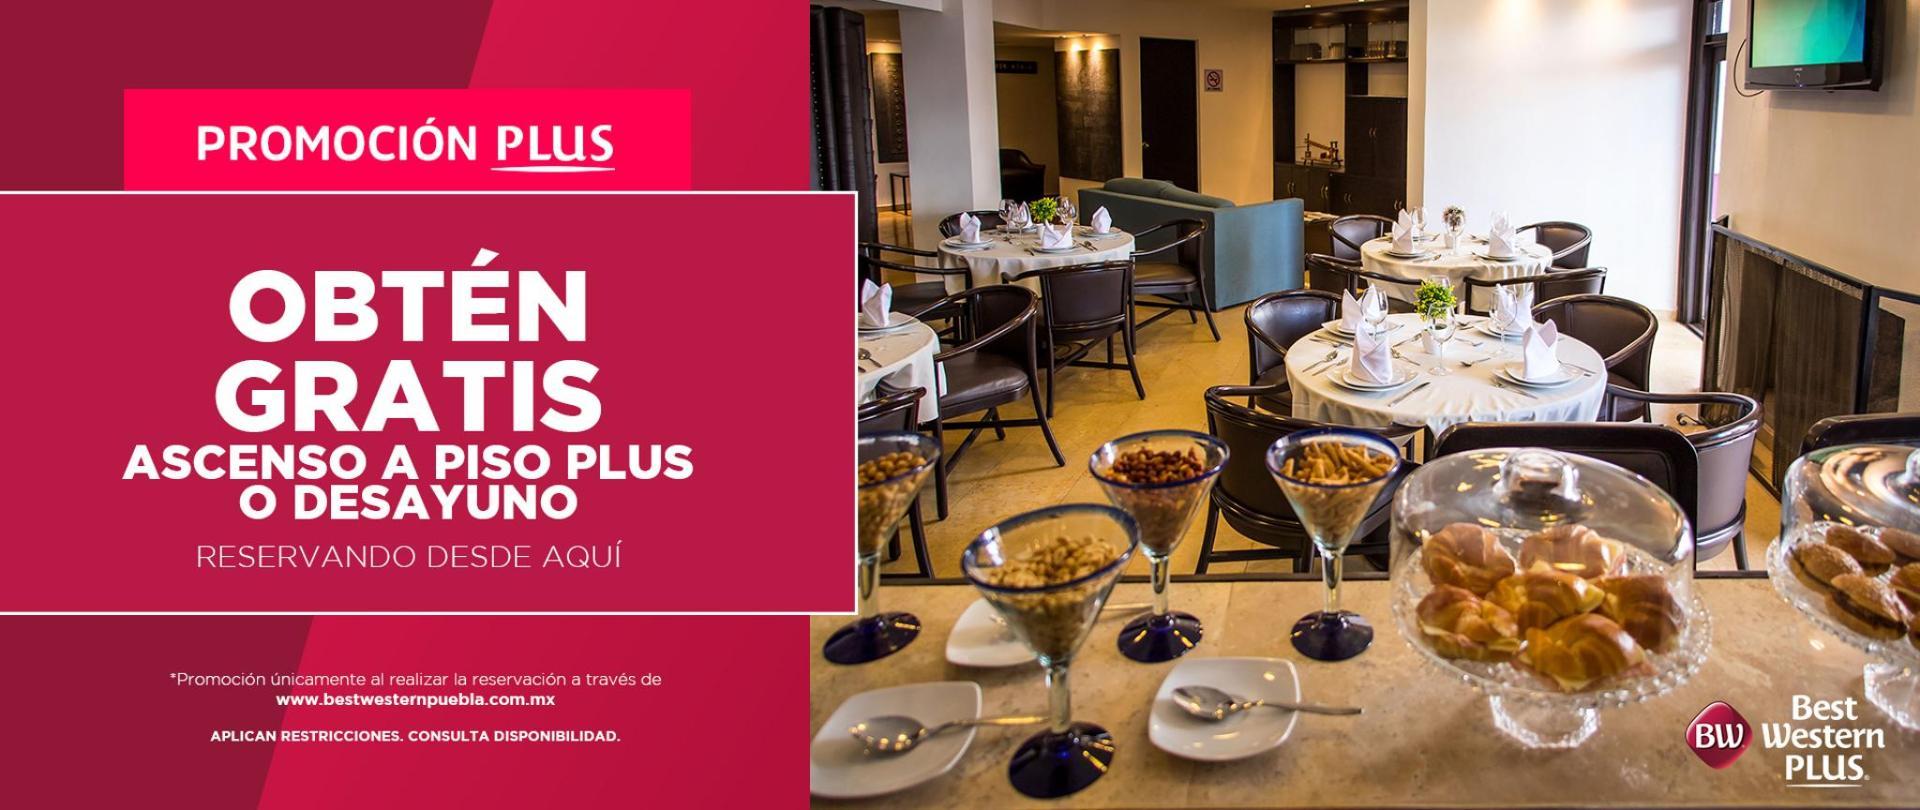 Hotel_Promocion_PisoPlus.png